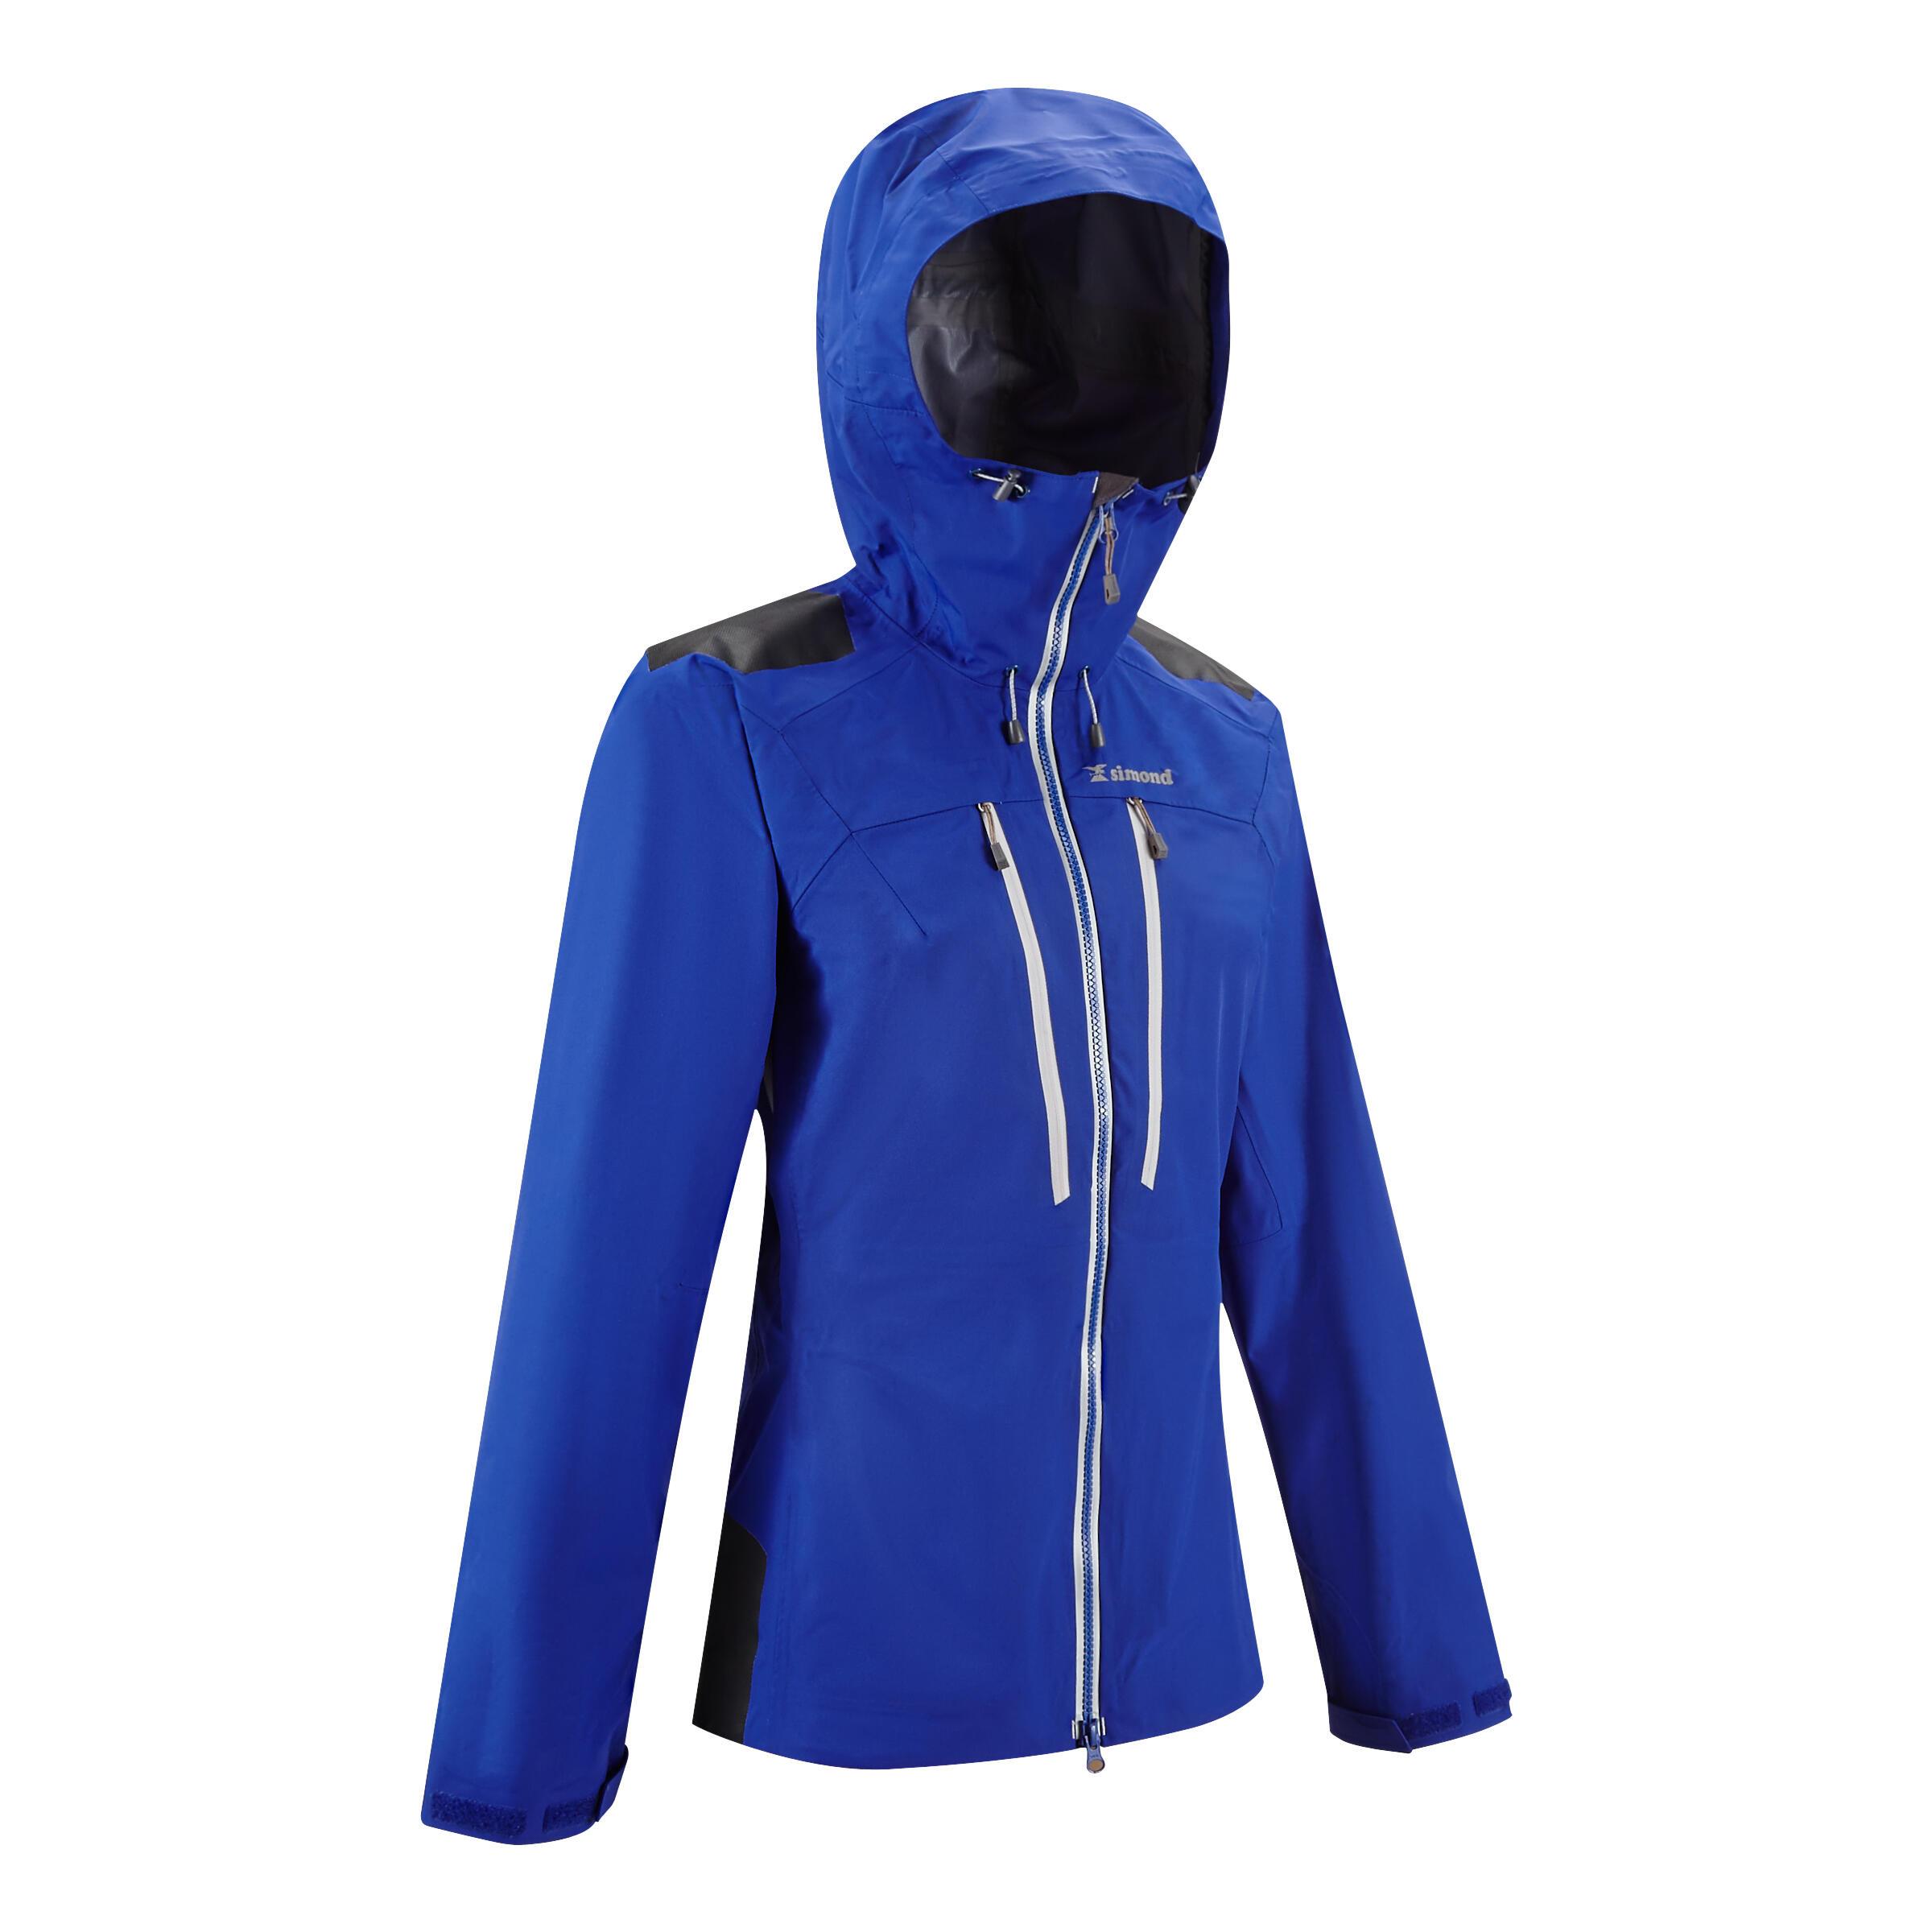 Women's Mountaineering Jacket - Indigo